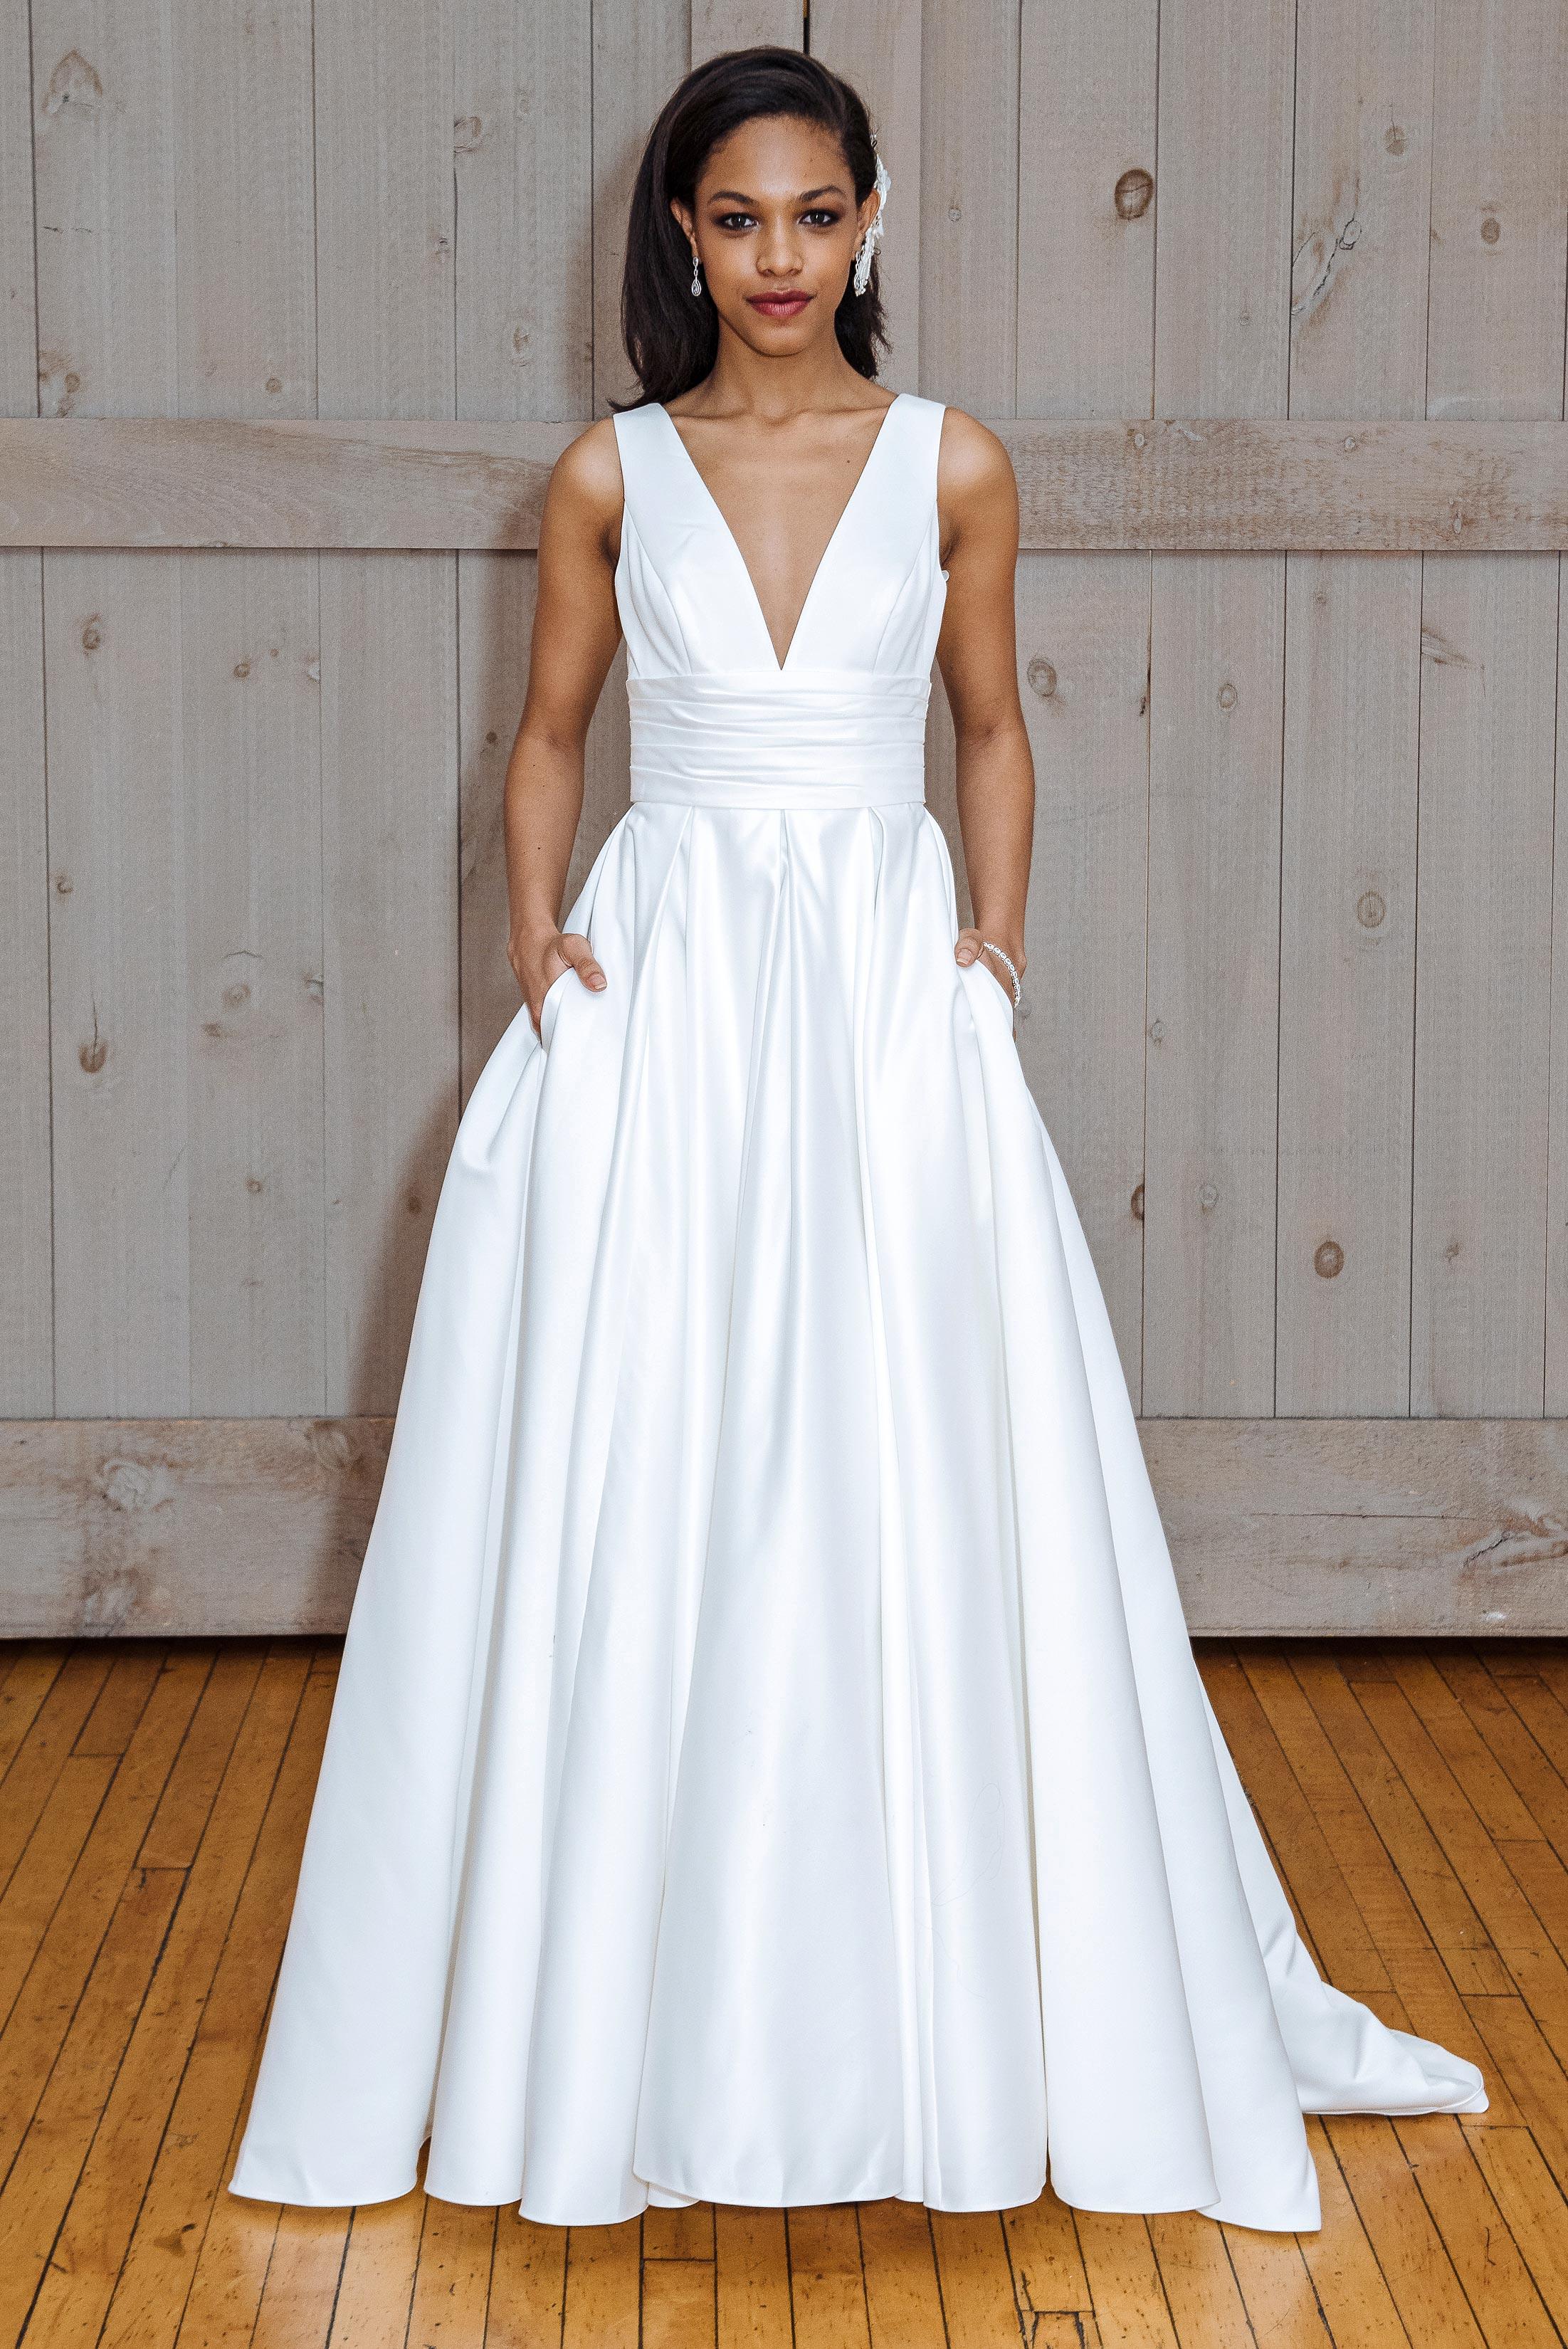 david's bridal pleated v-neck wedding dress spring 2018